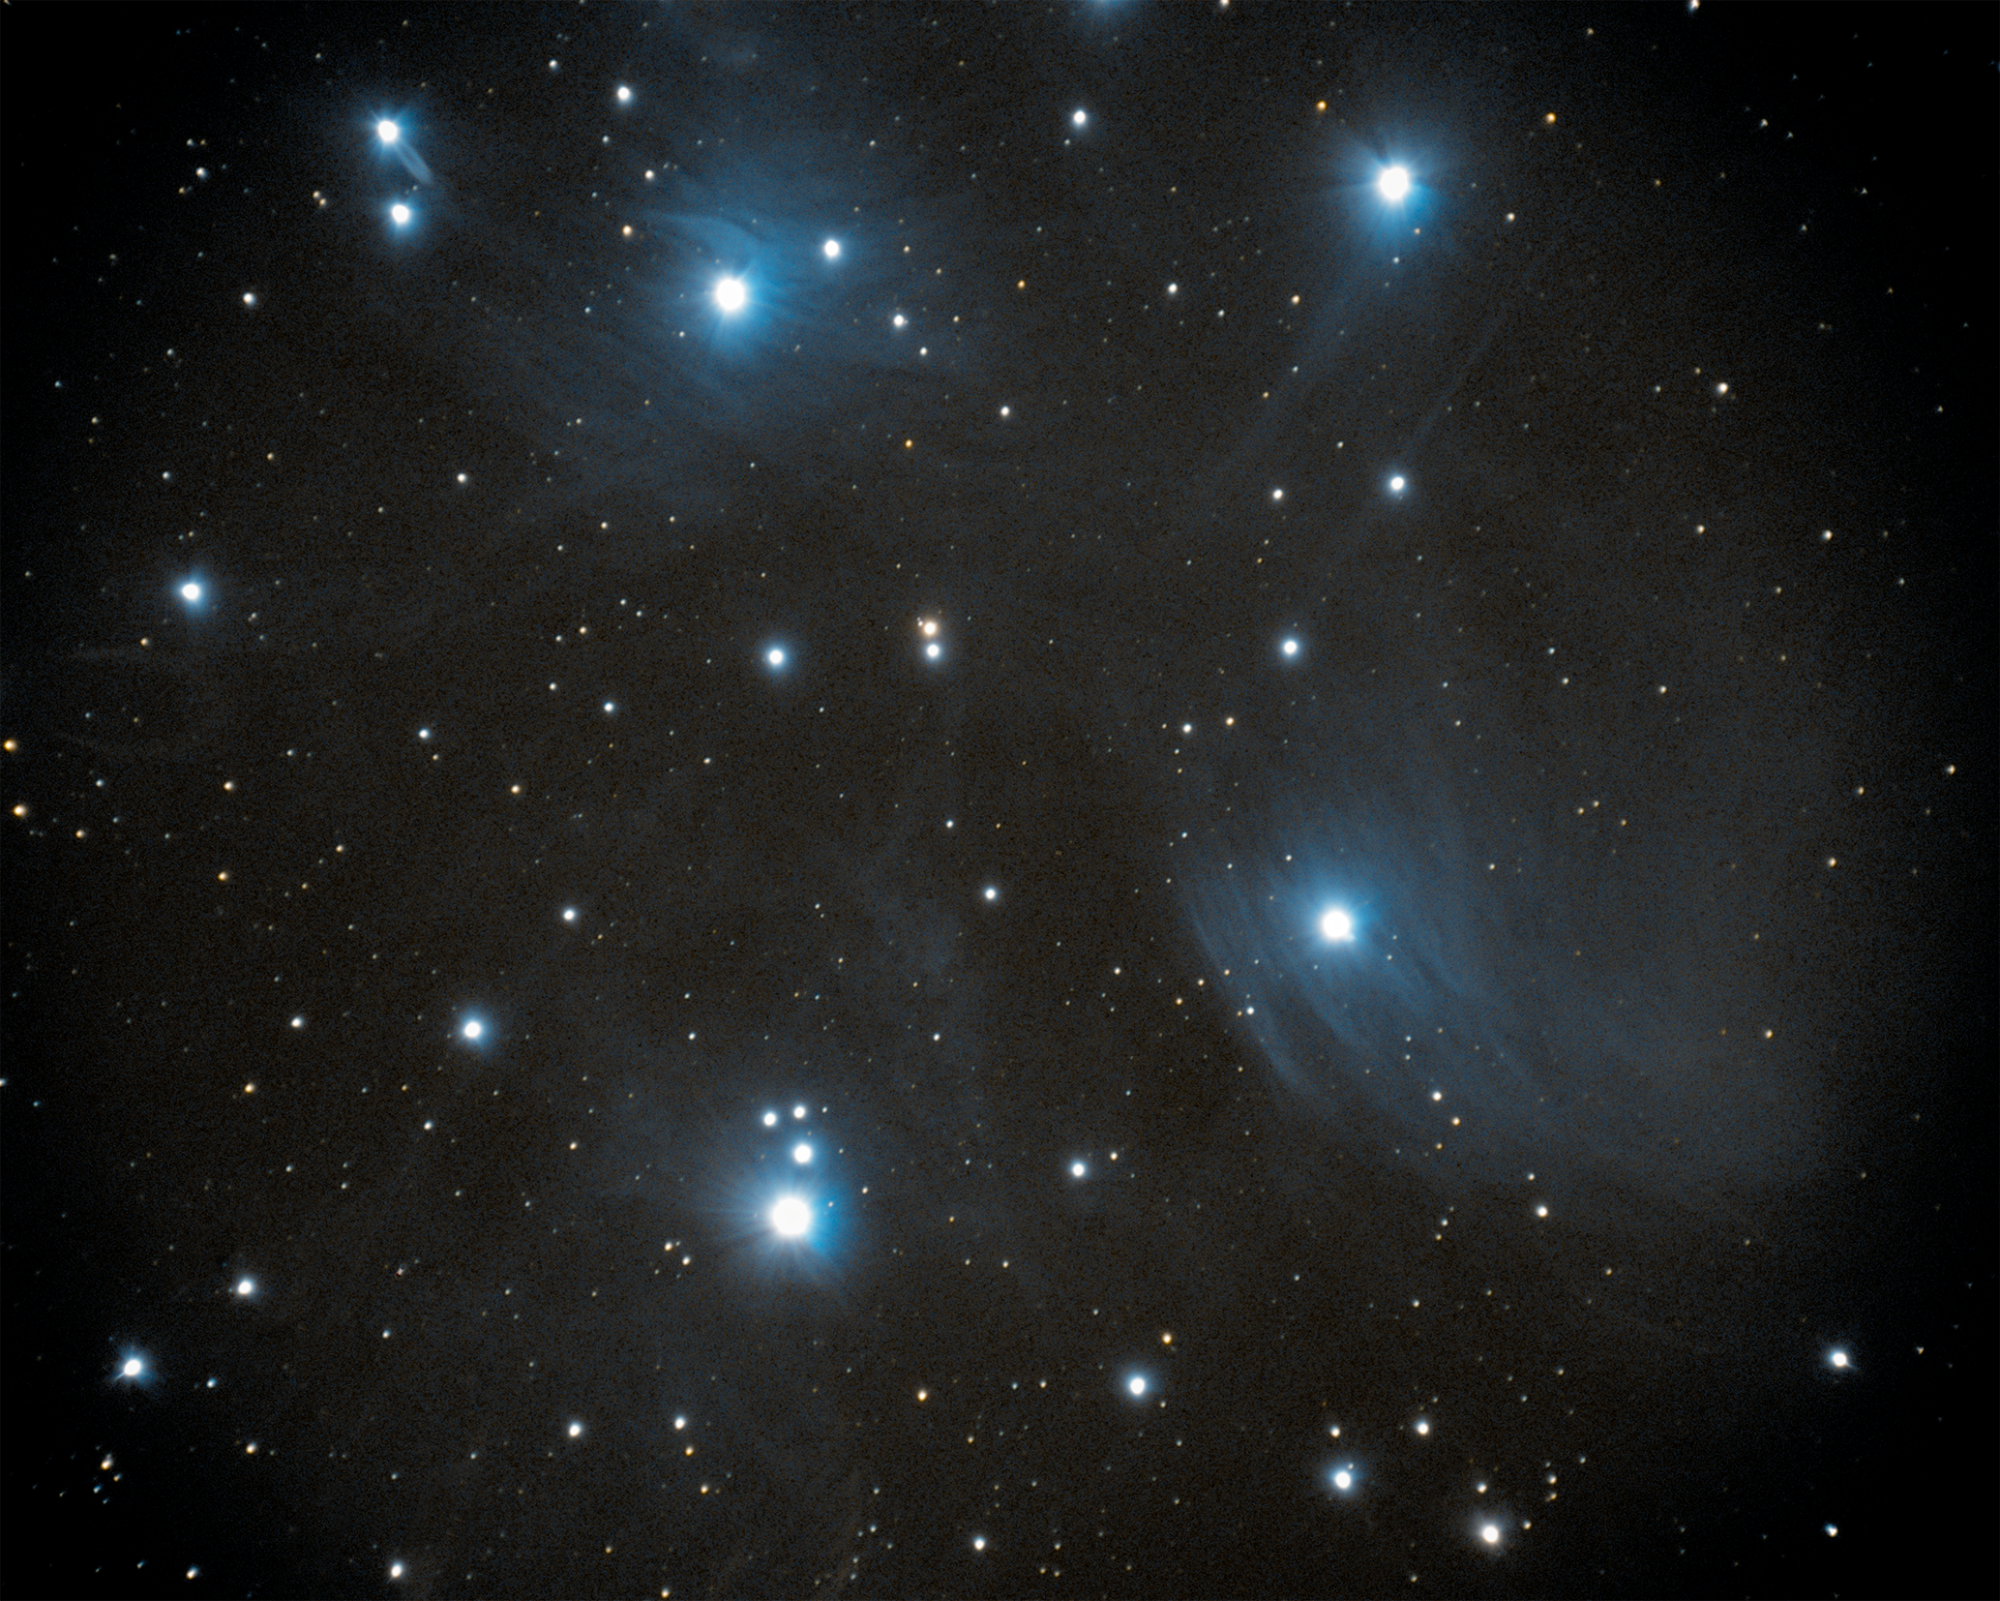 M45SiriL.thumb.png.84c82cf9cc7b12e247a1cce434c2cf00.png